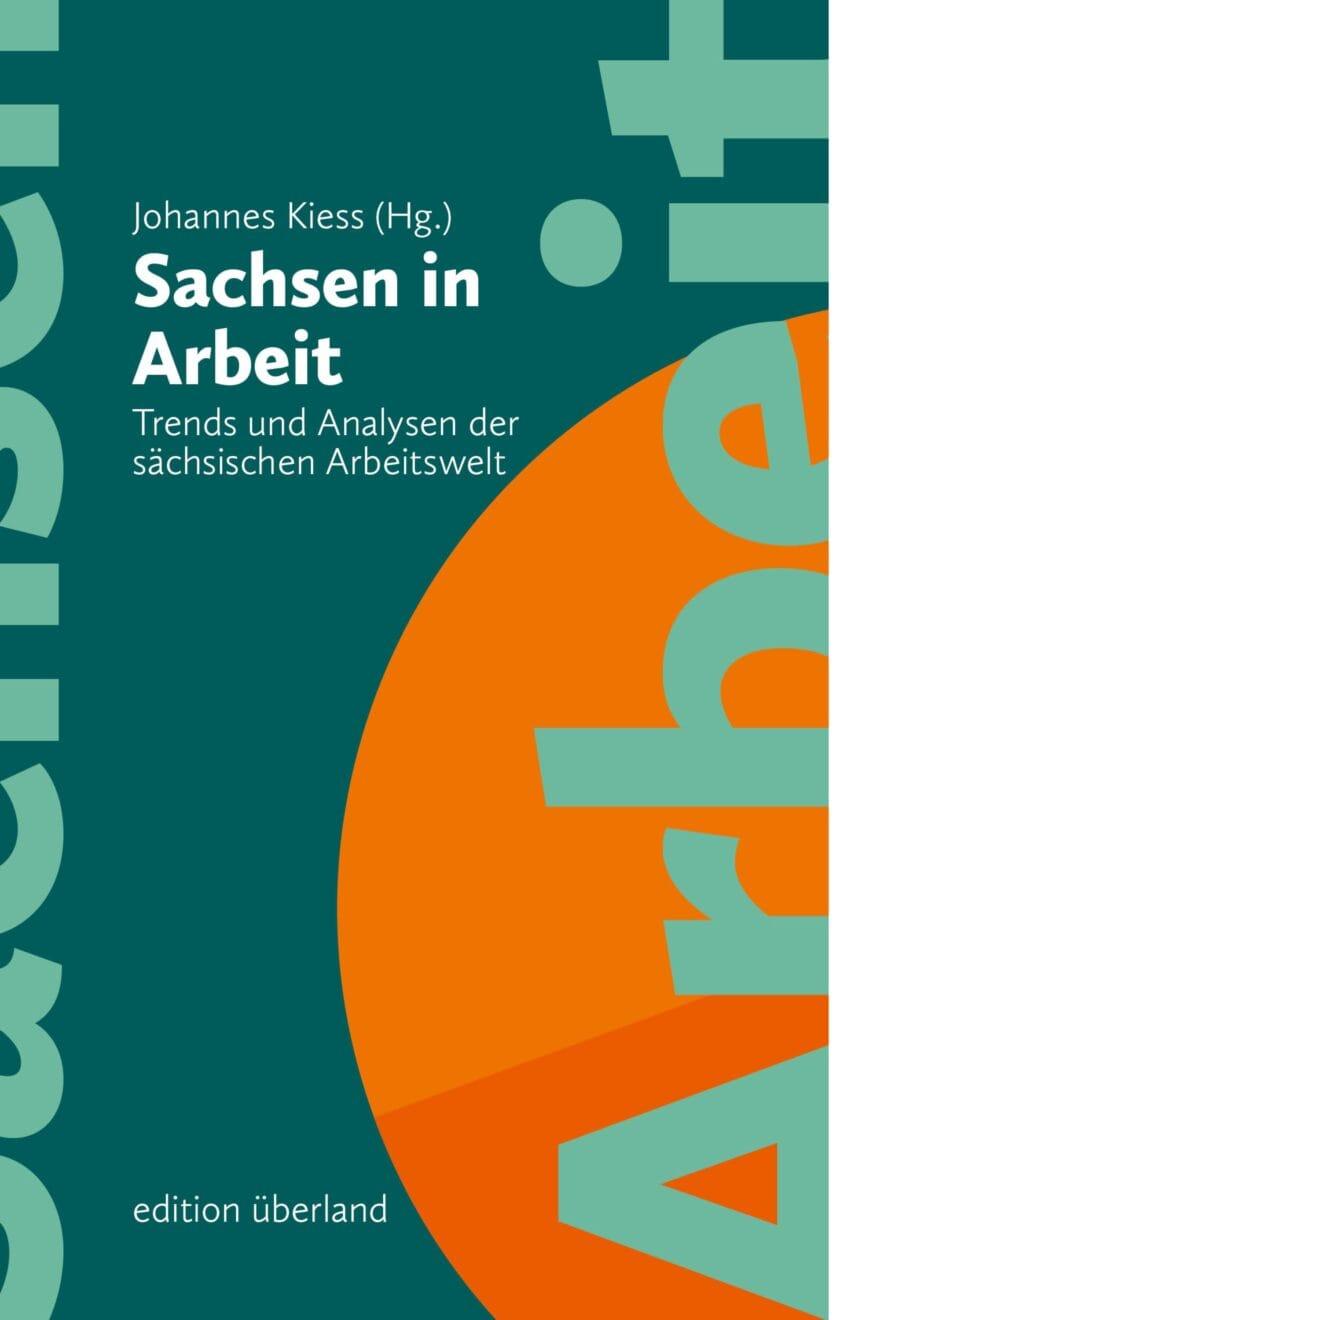 Johannes Kiess (Hg.): »Sachsen in Arbeit«